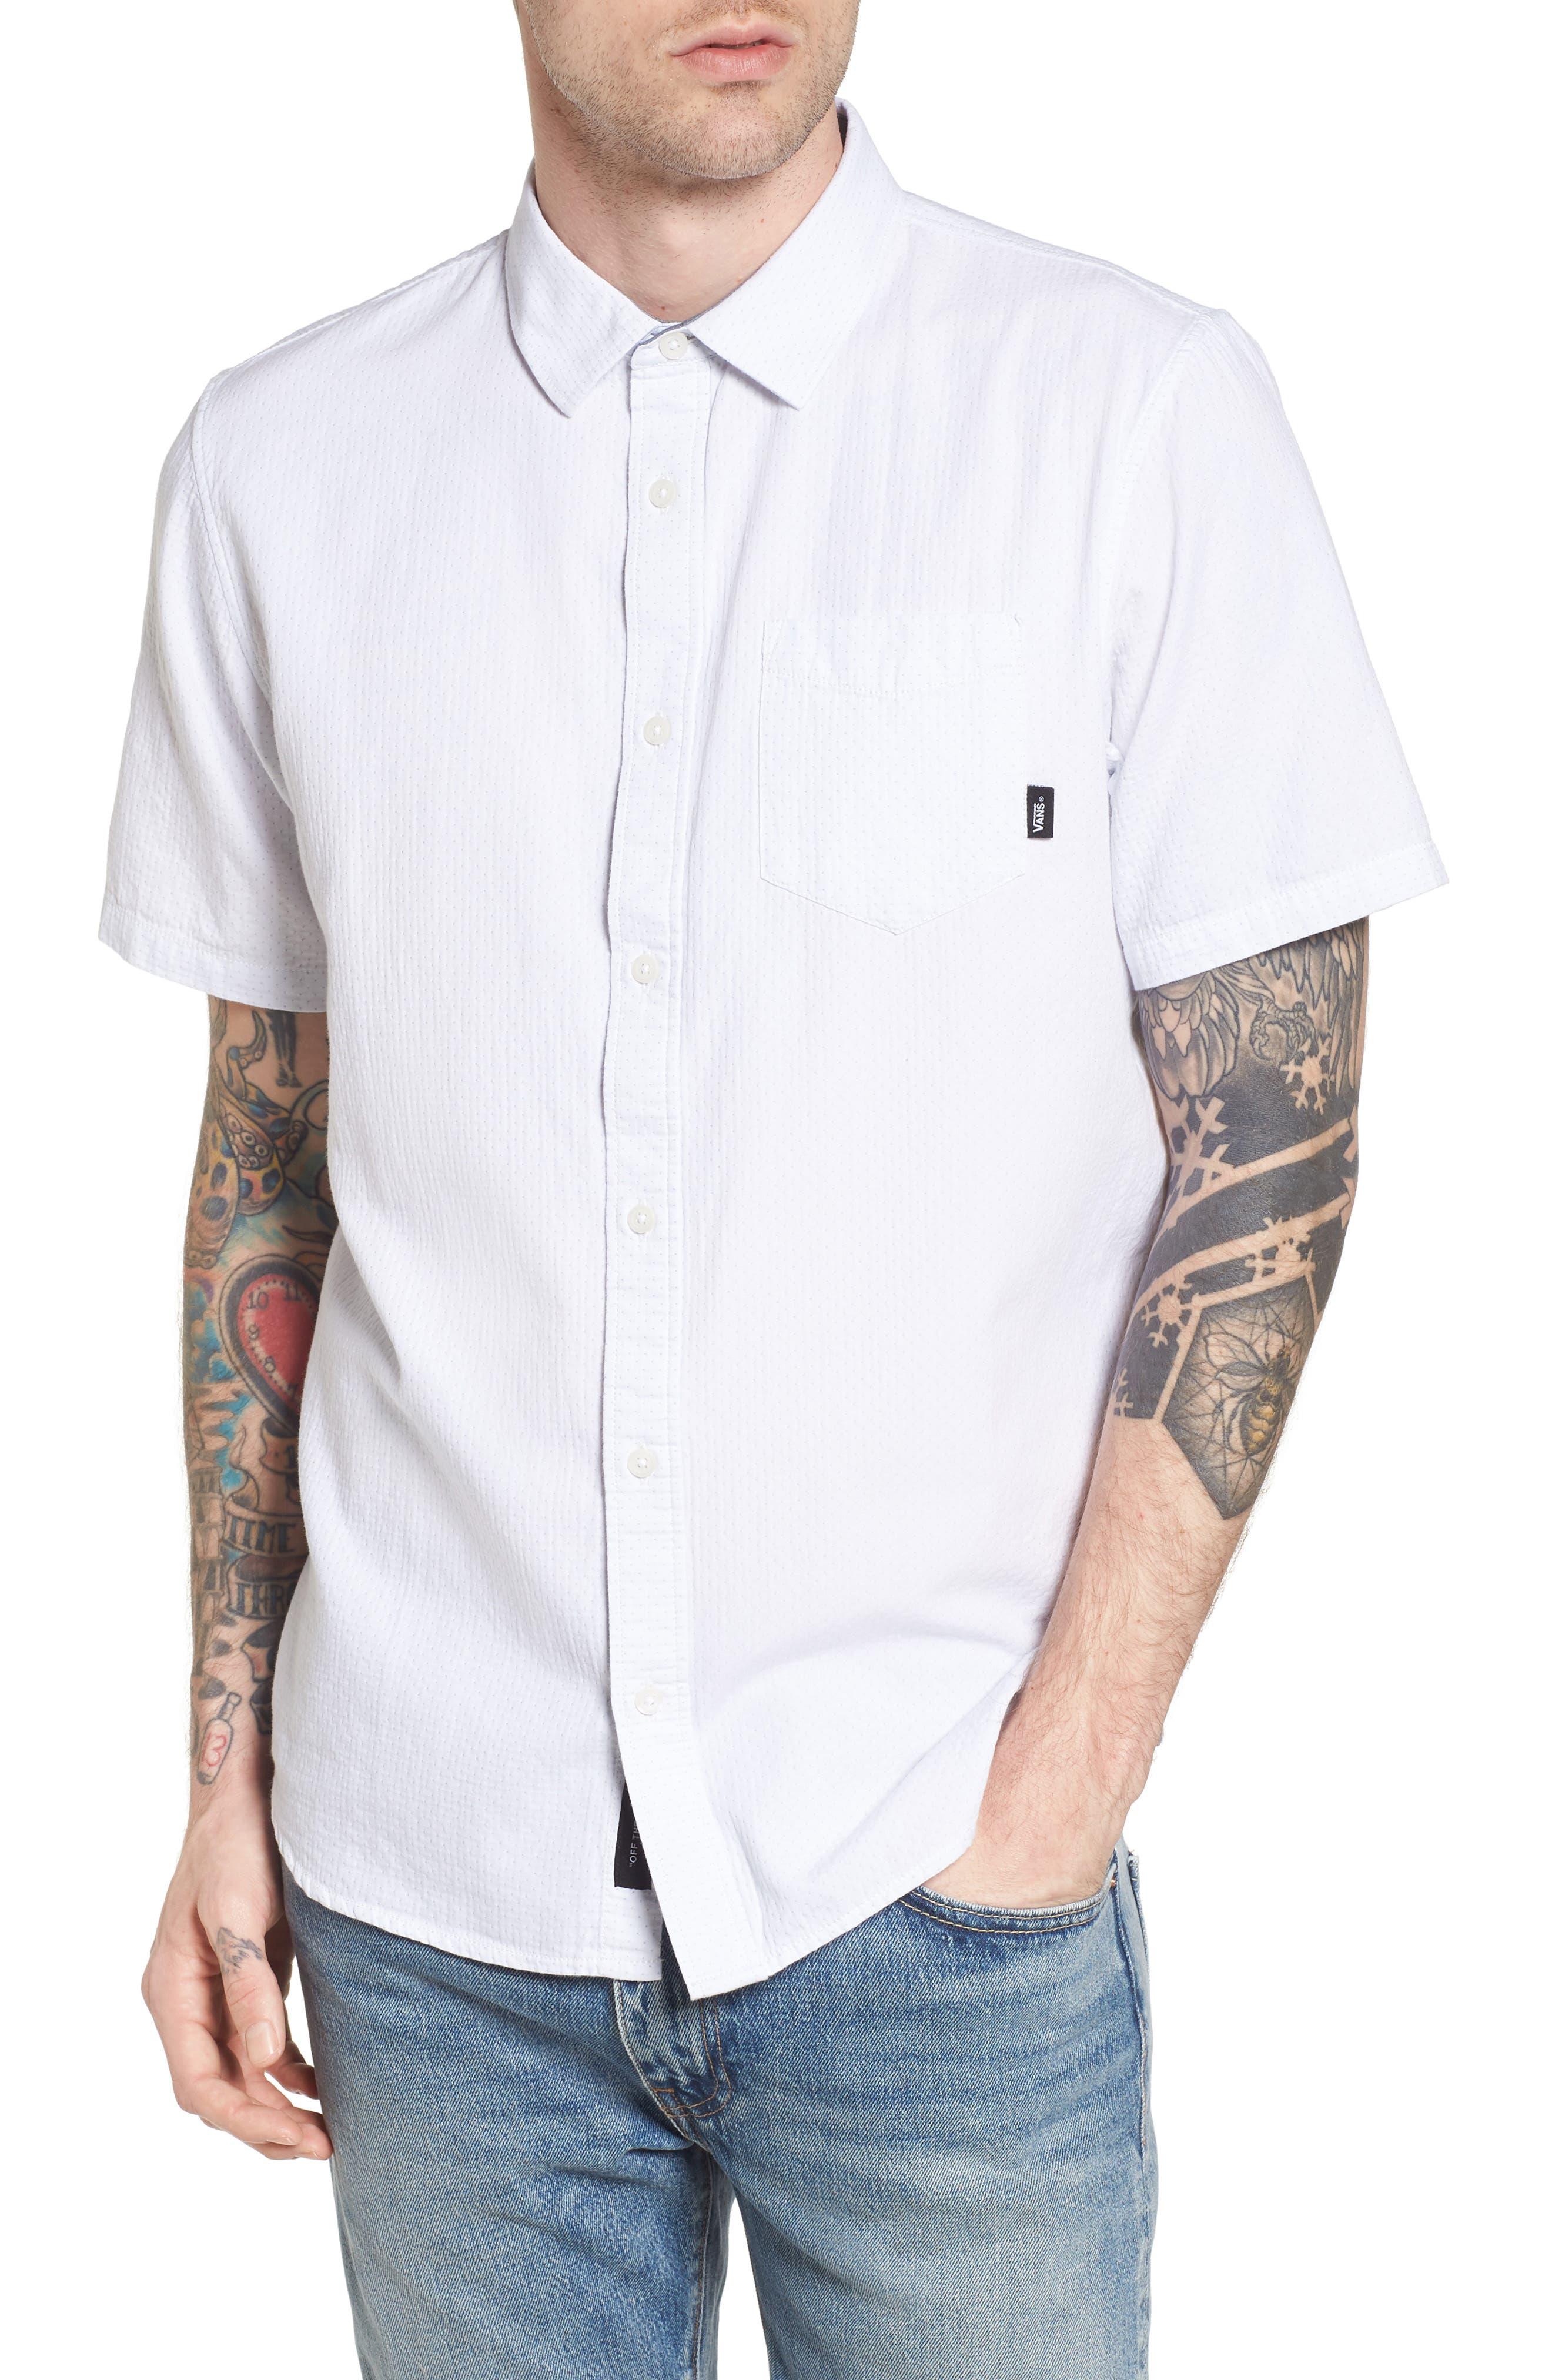 Fairdale Woven Shirt,                         Main,                         color, White